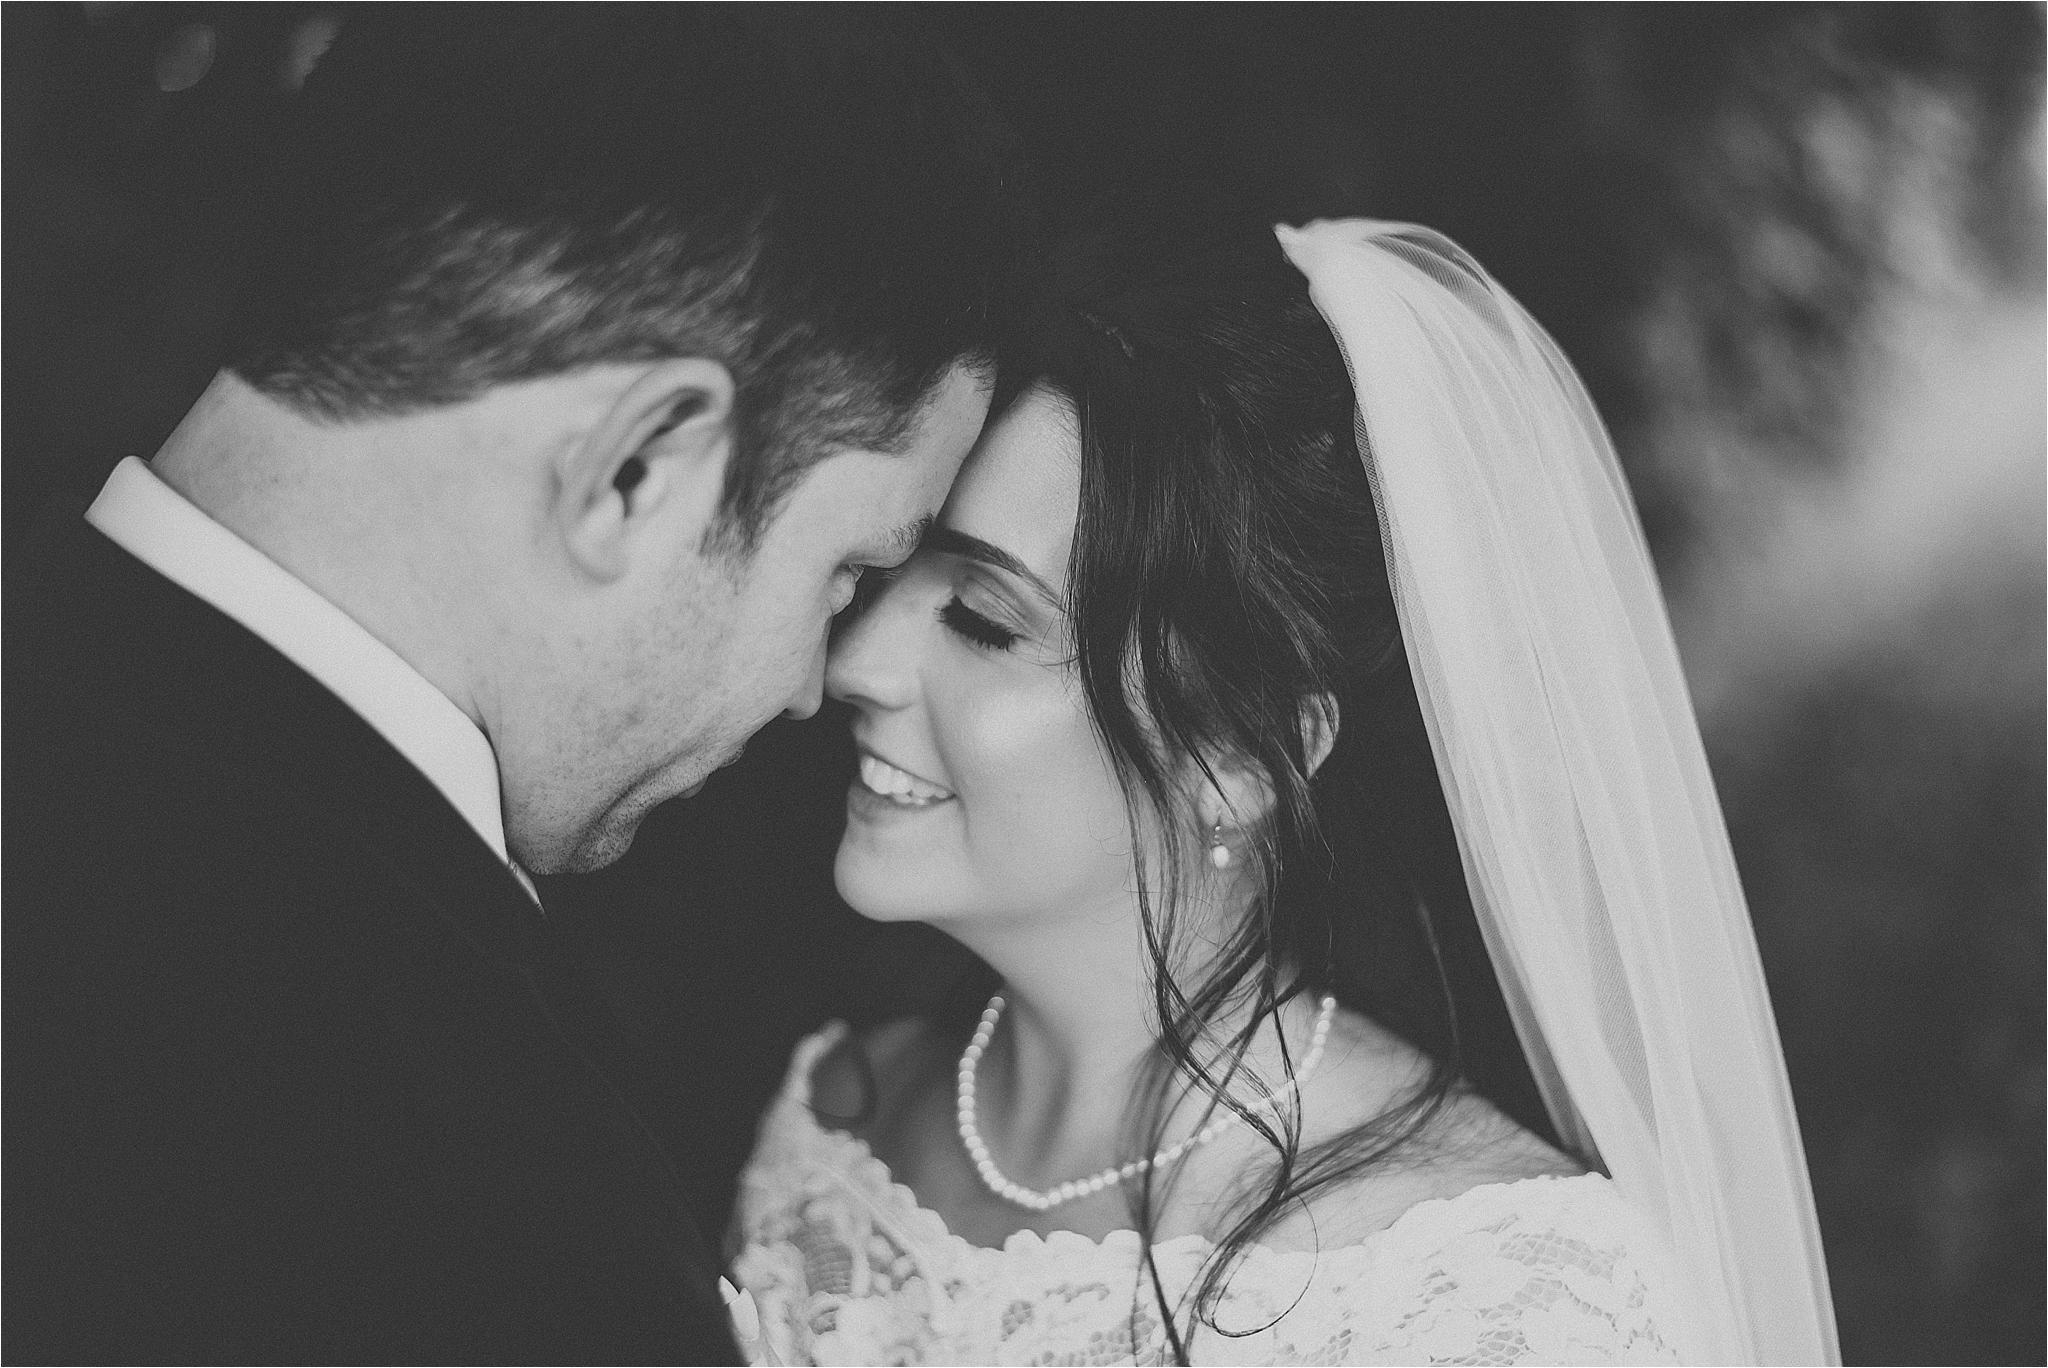 thevilla+lancashire+wreagreen+wedding+photographer40.jpg